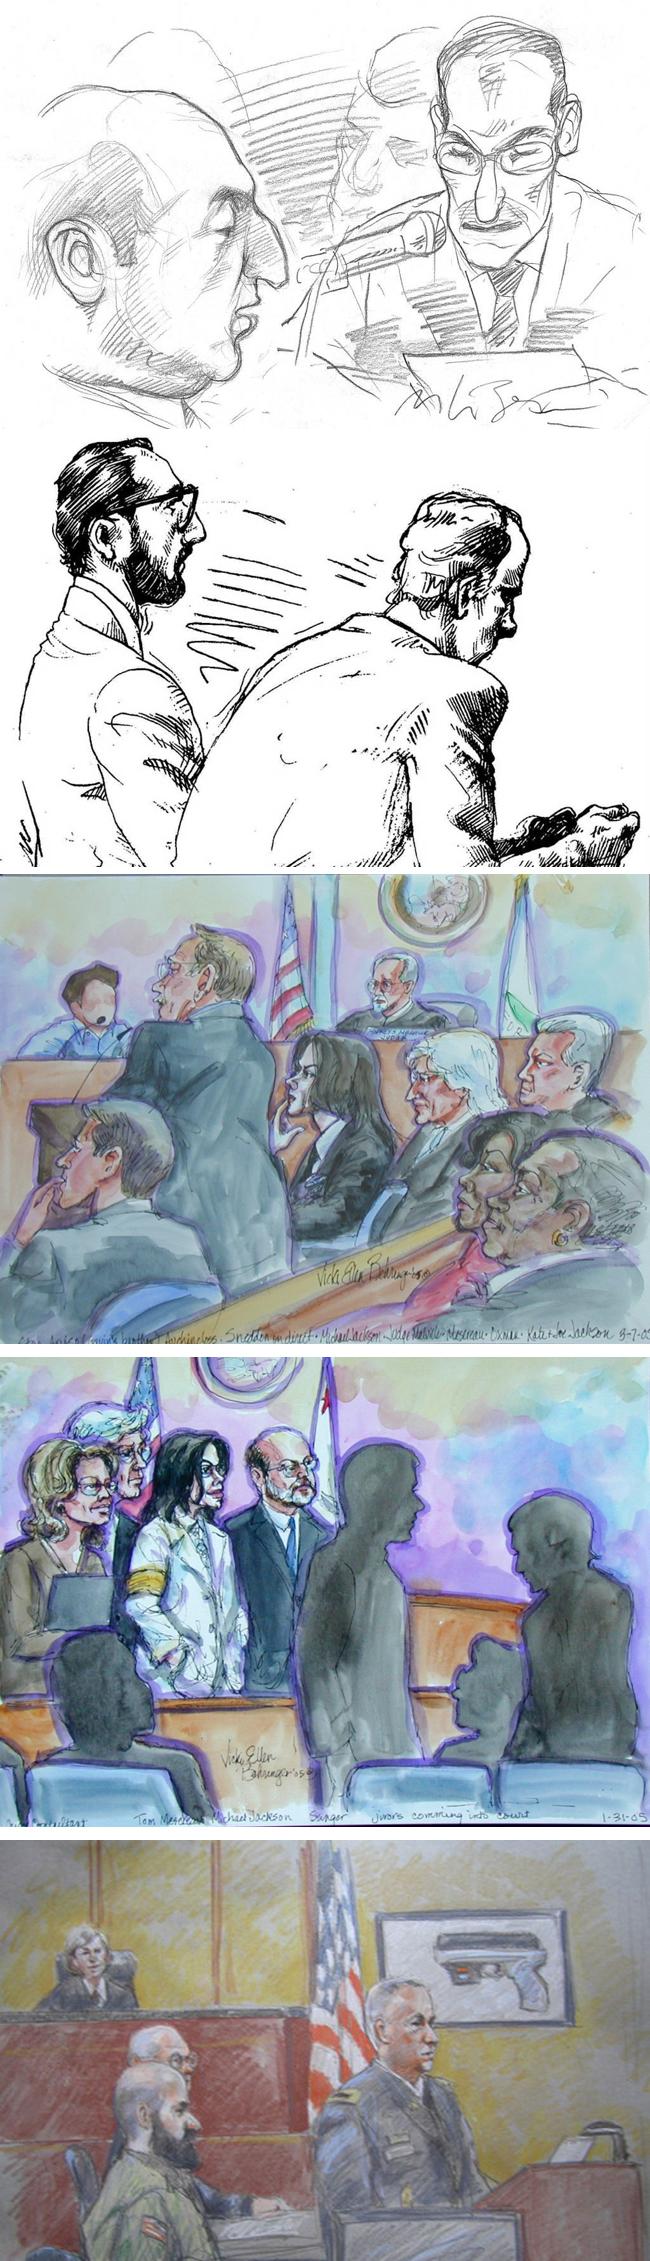 dibujante-juicio-estrado-madrid-dibujos-academiac10